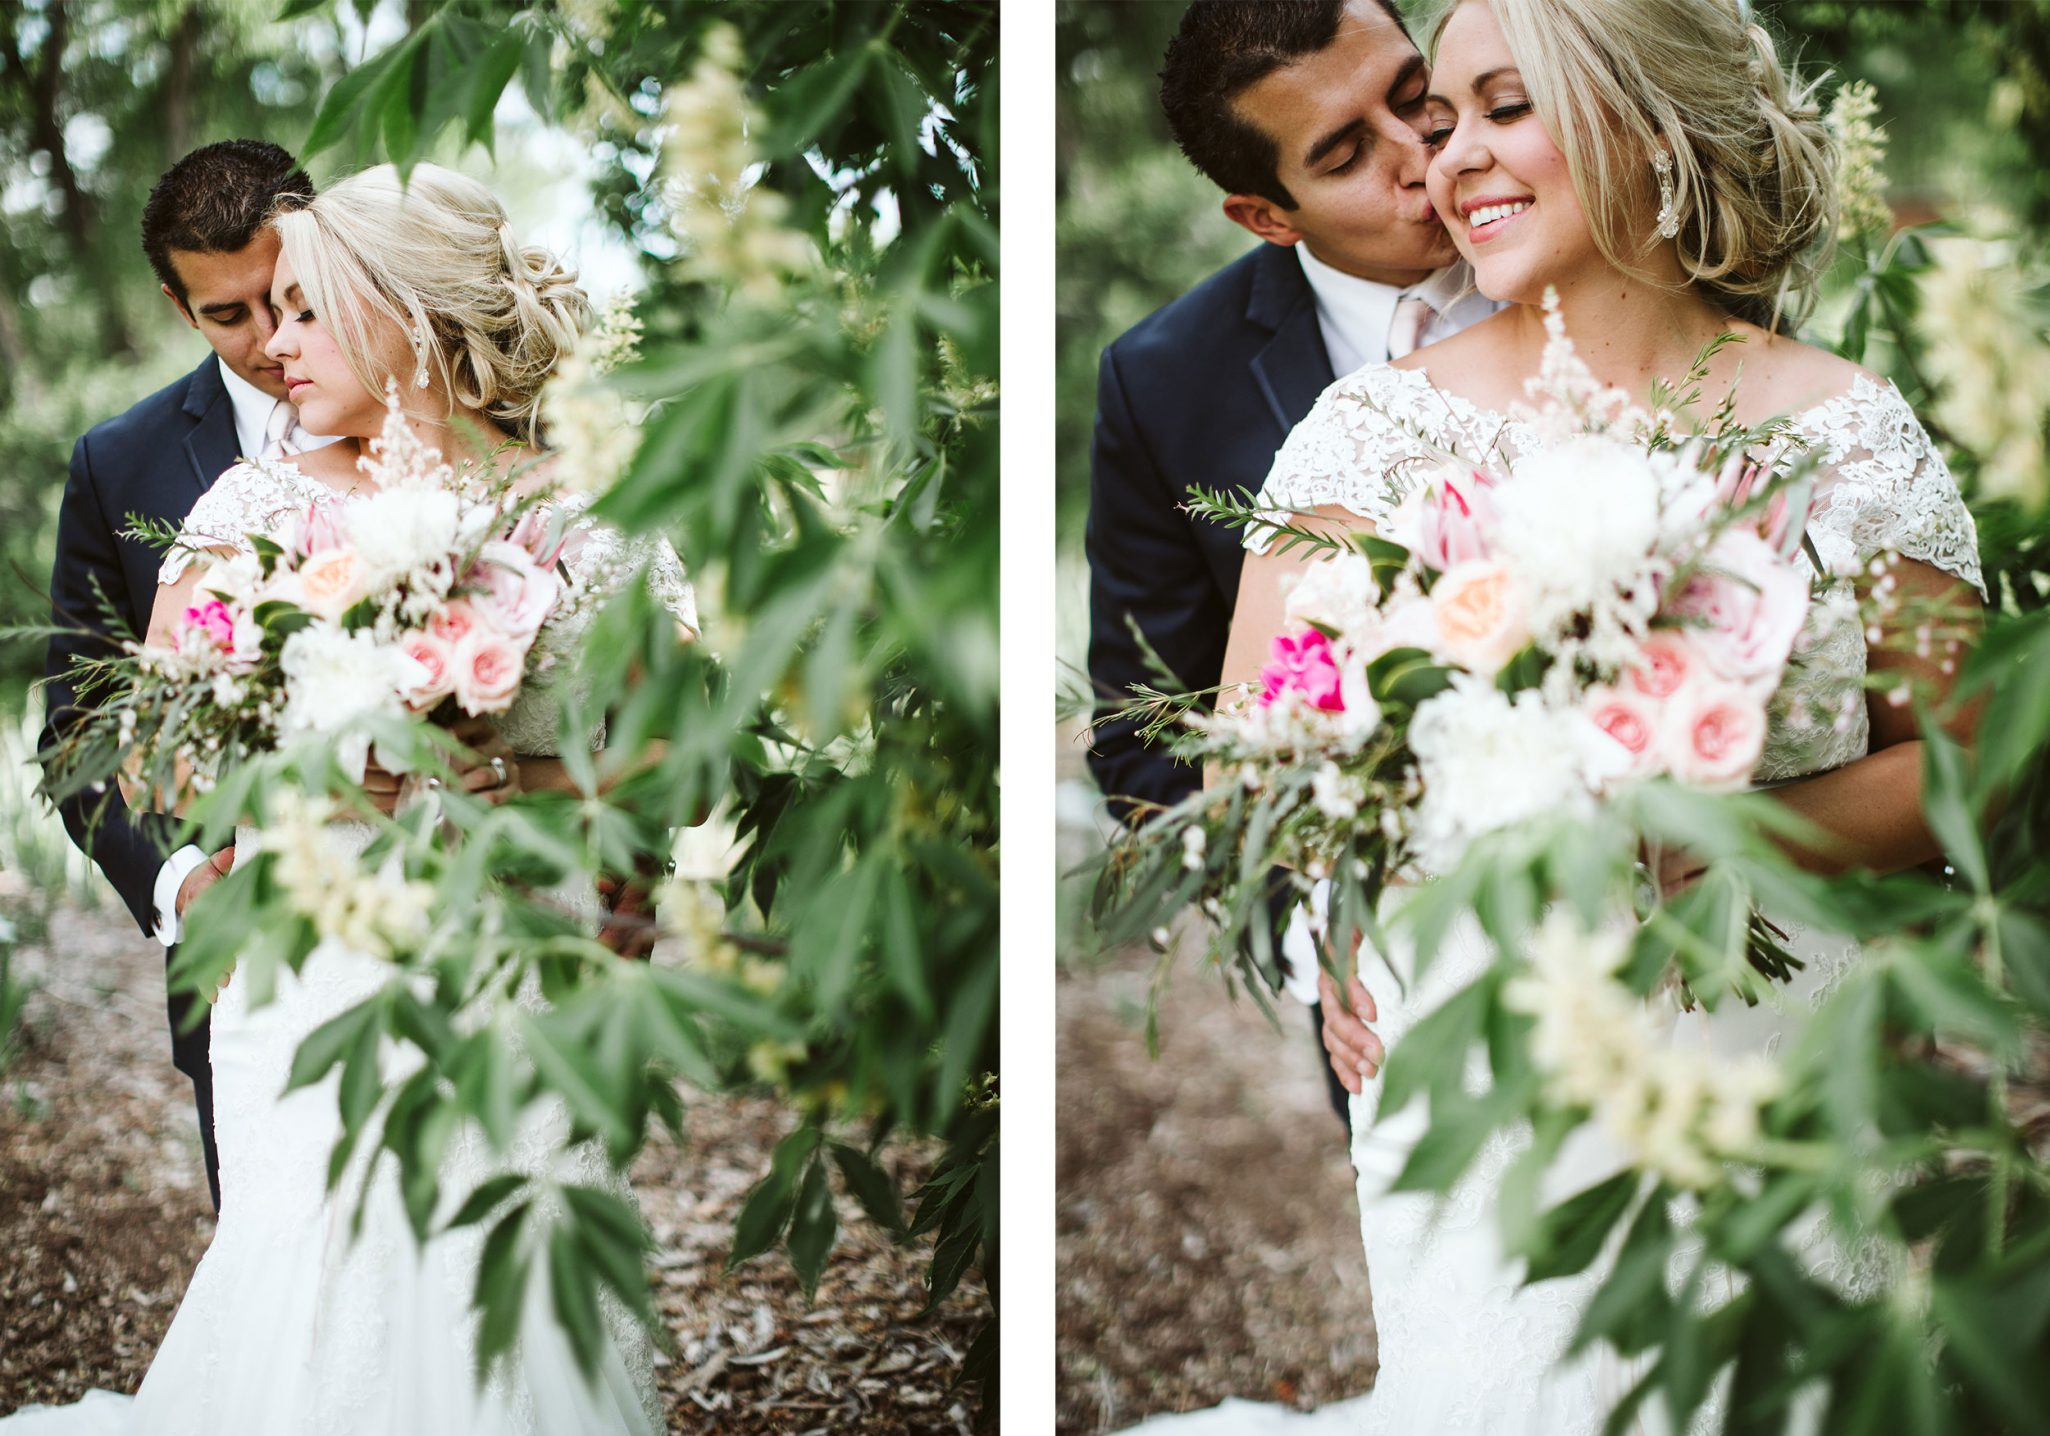 A Fun & Personalized Durango Wedding